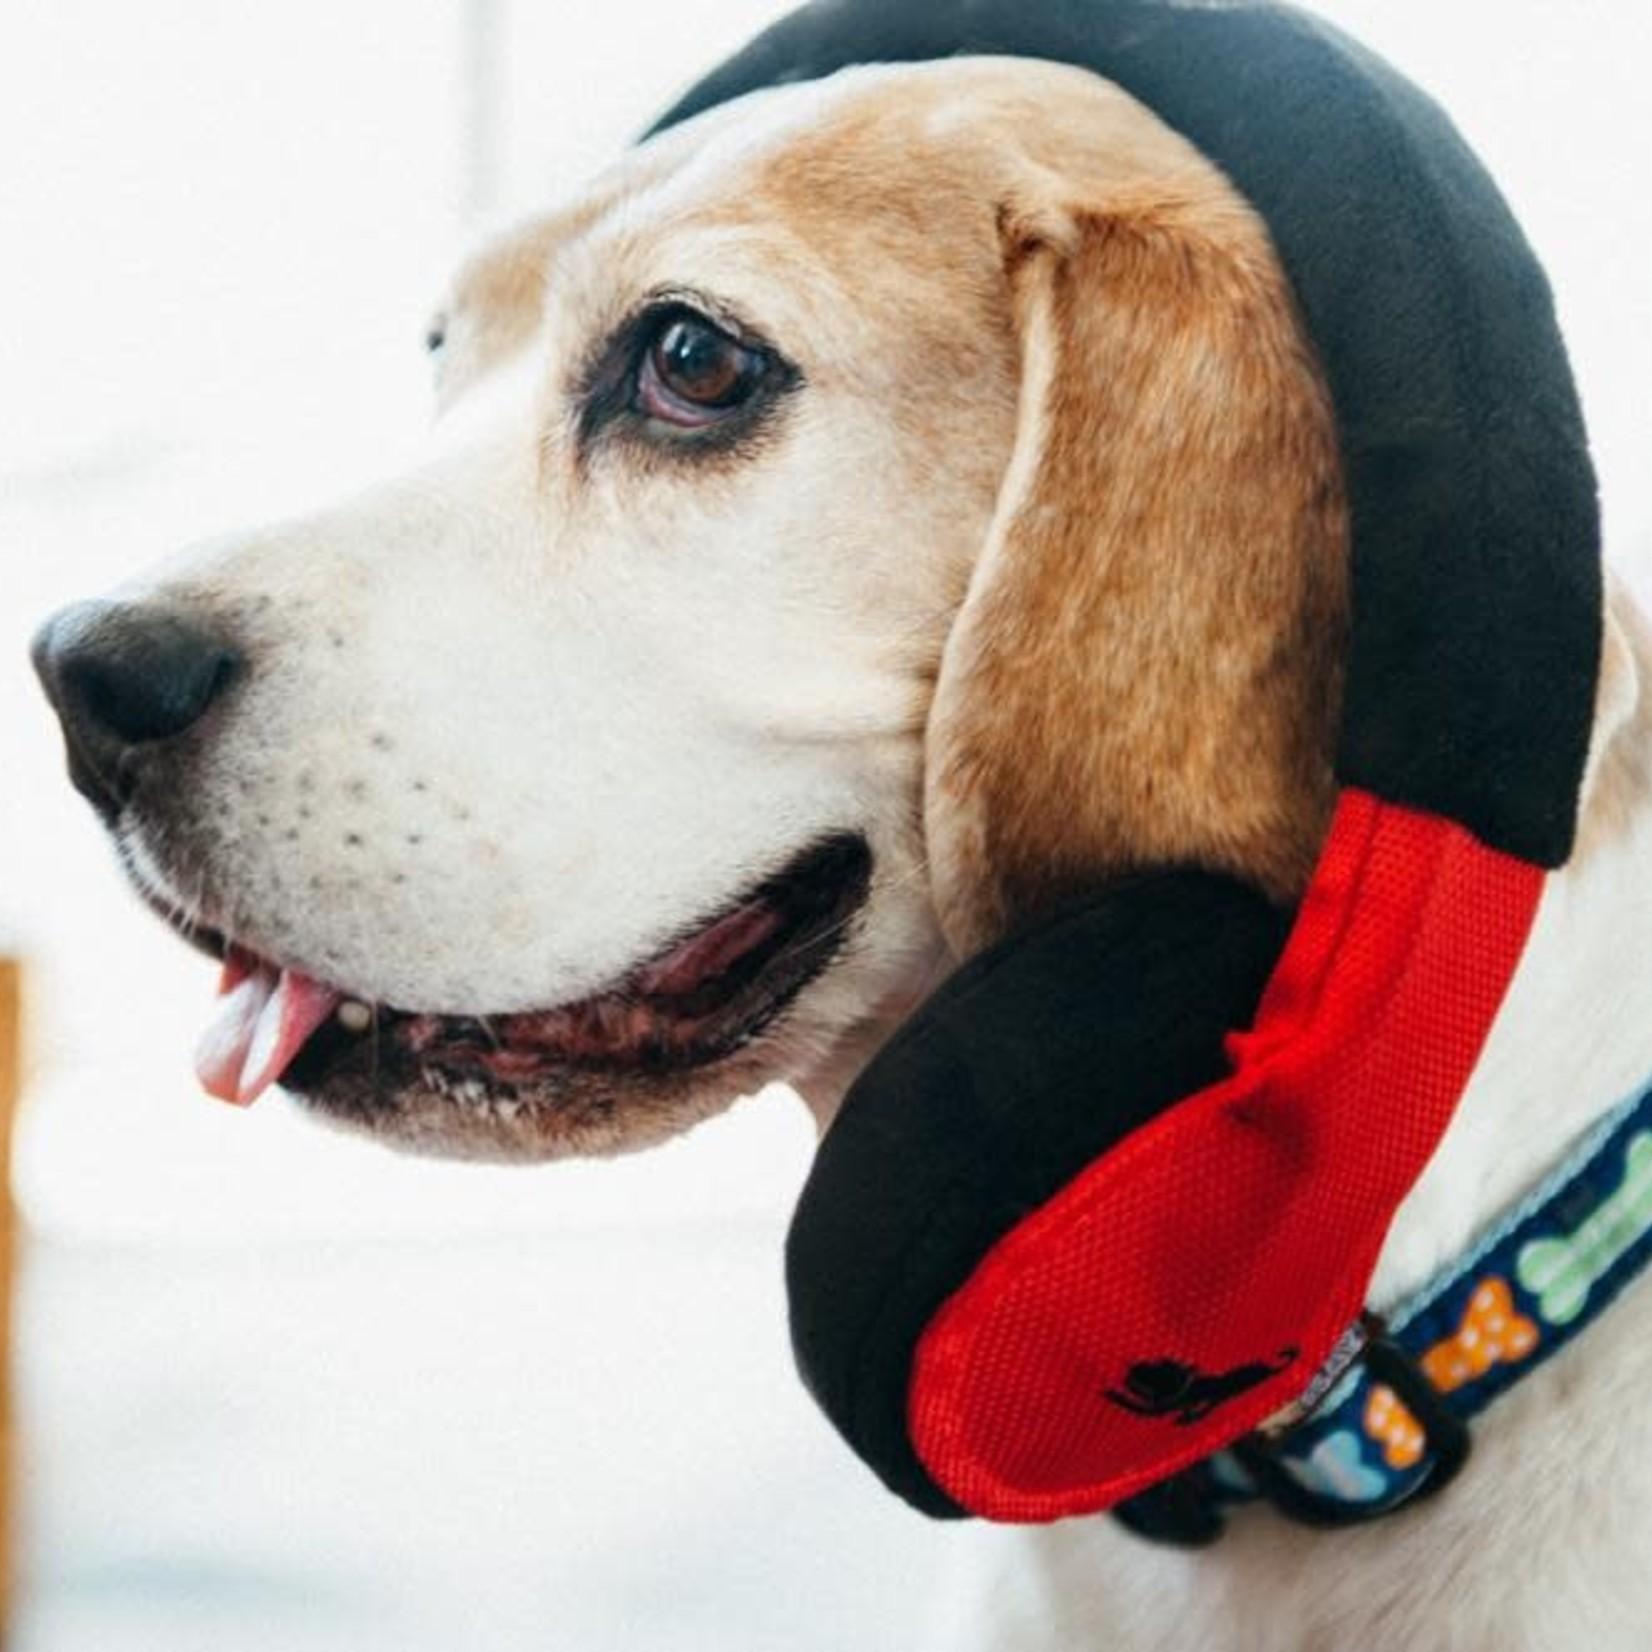 PLAY PLAY Globetrotter - Headphone